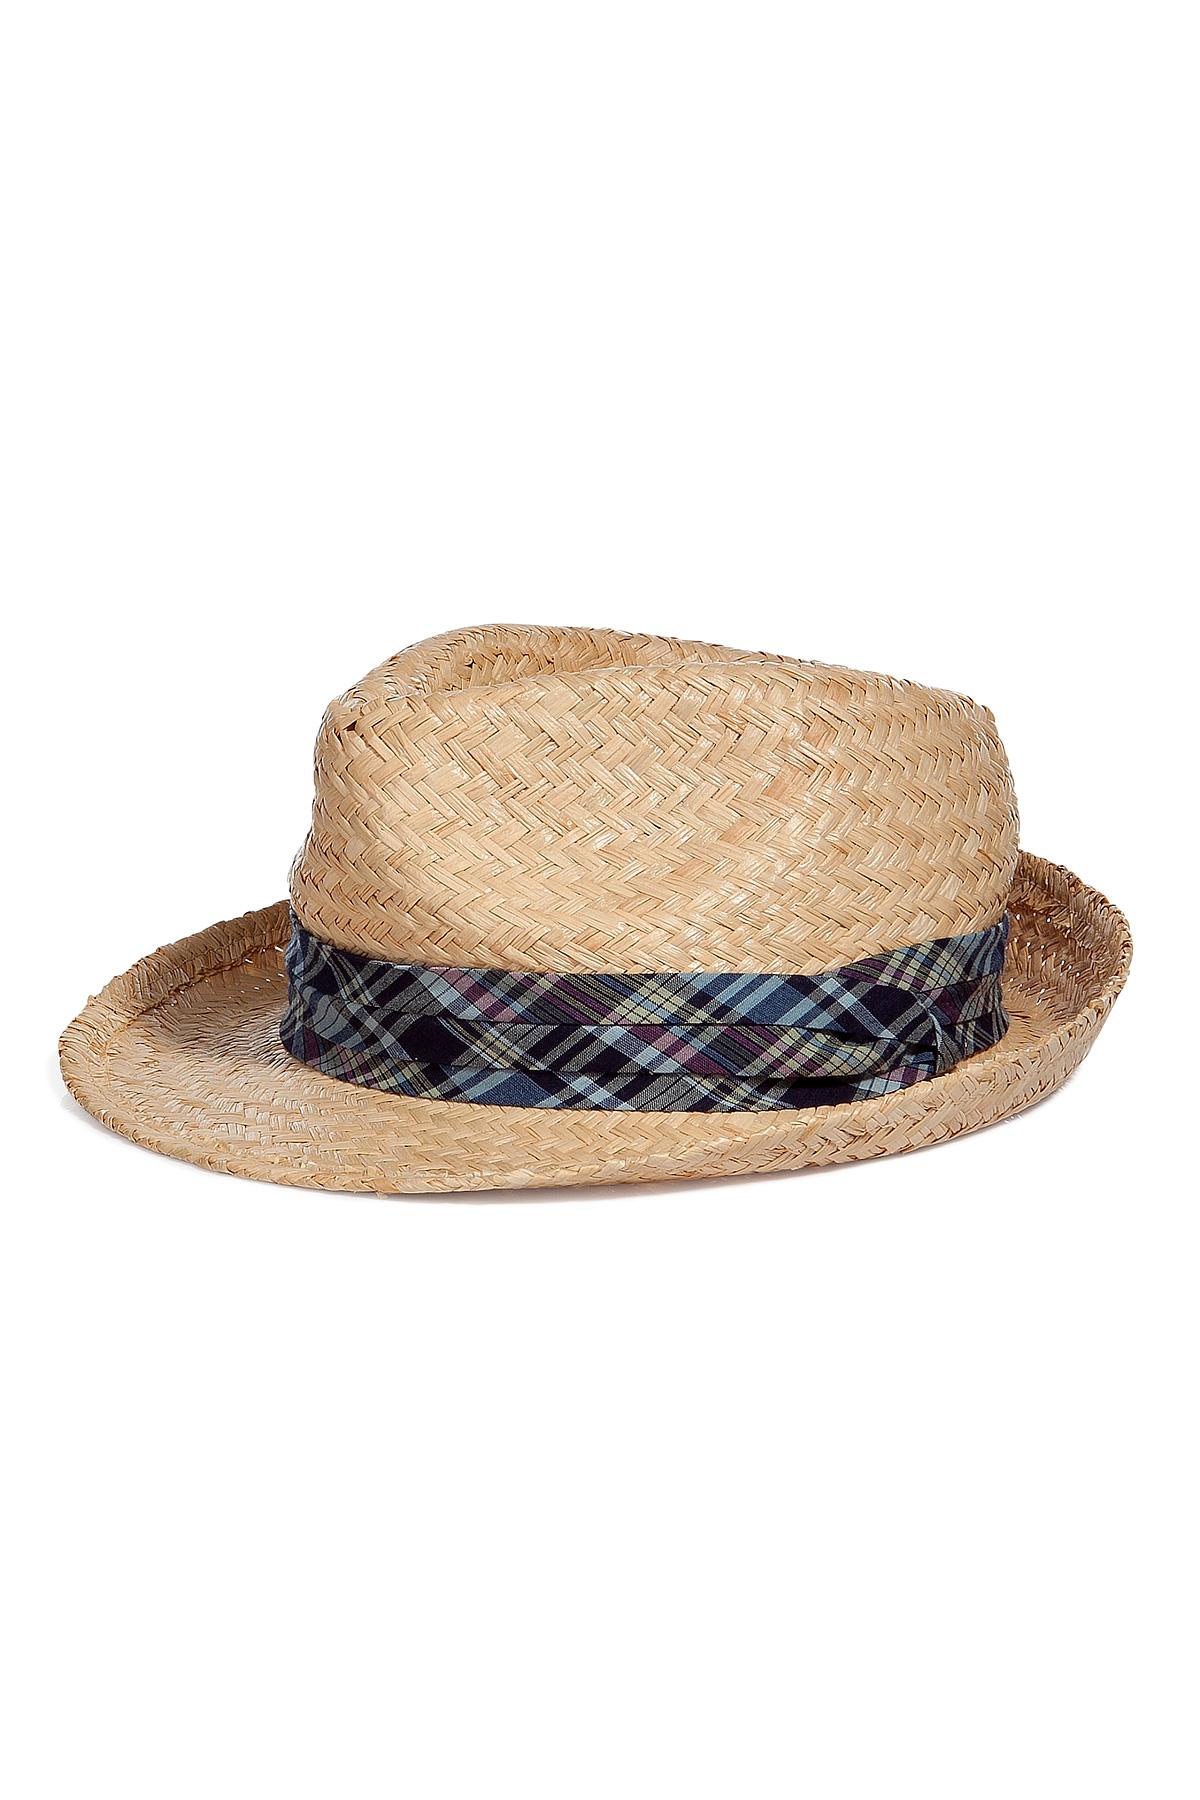 Lyst - Polo Ralph Lauren Hand-woven Straw Panama Hat in Black for Men